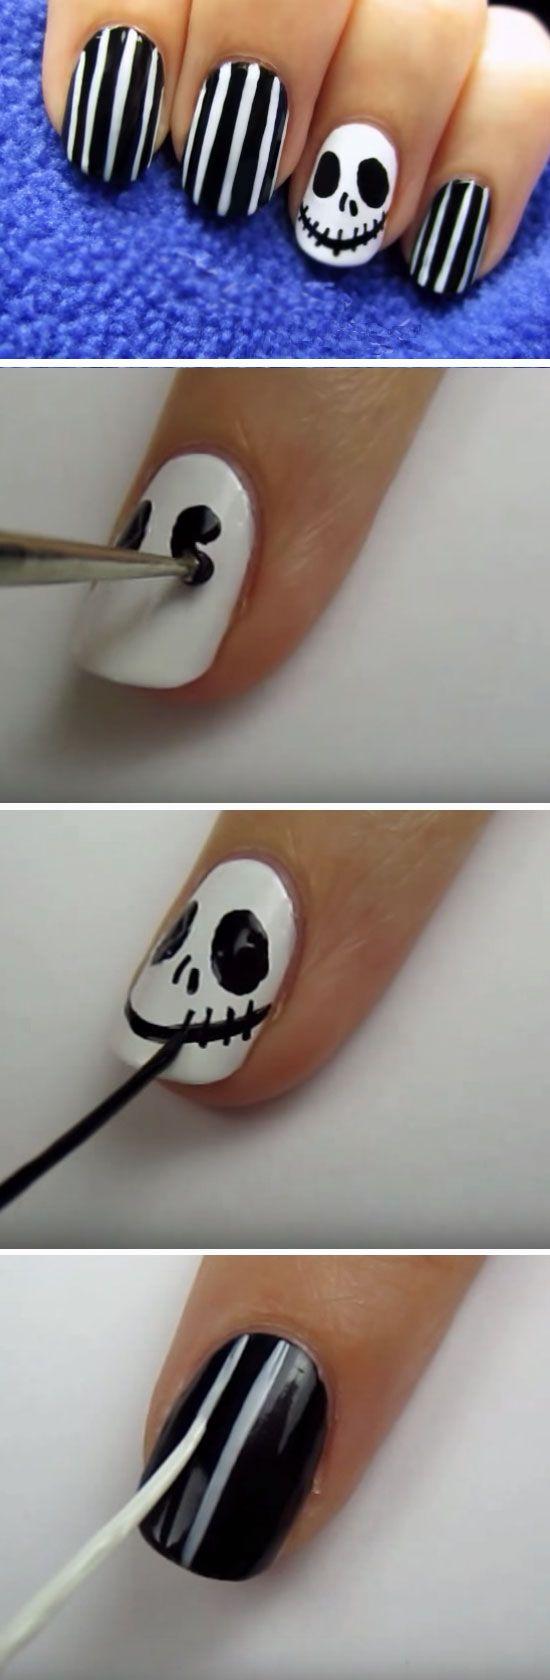 Jack Skellington | Click Pic for 23 Spooky Nail Art Ideas for Halloween | DIY Halloween Nail Art for Kids